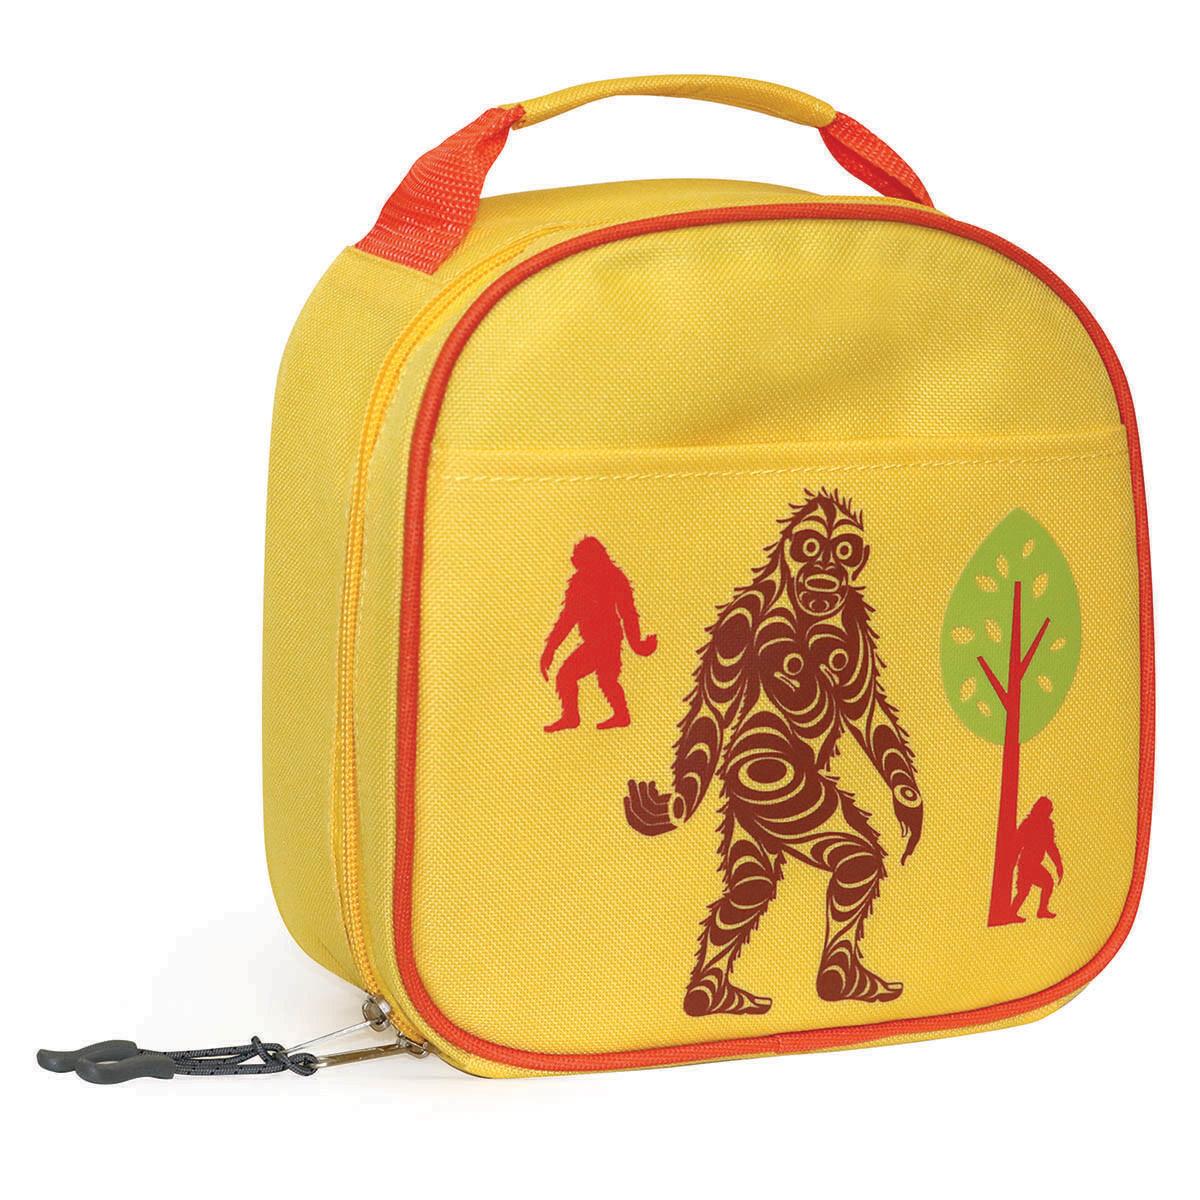 Insulated Lunch Bag - Sasquatch